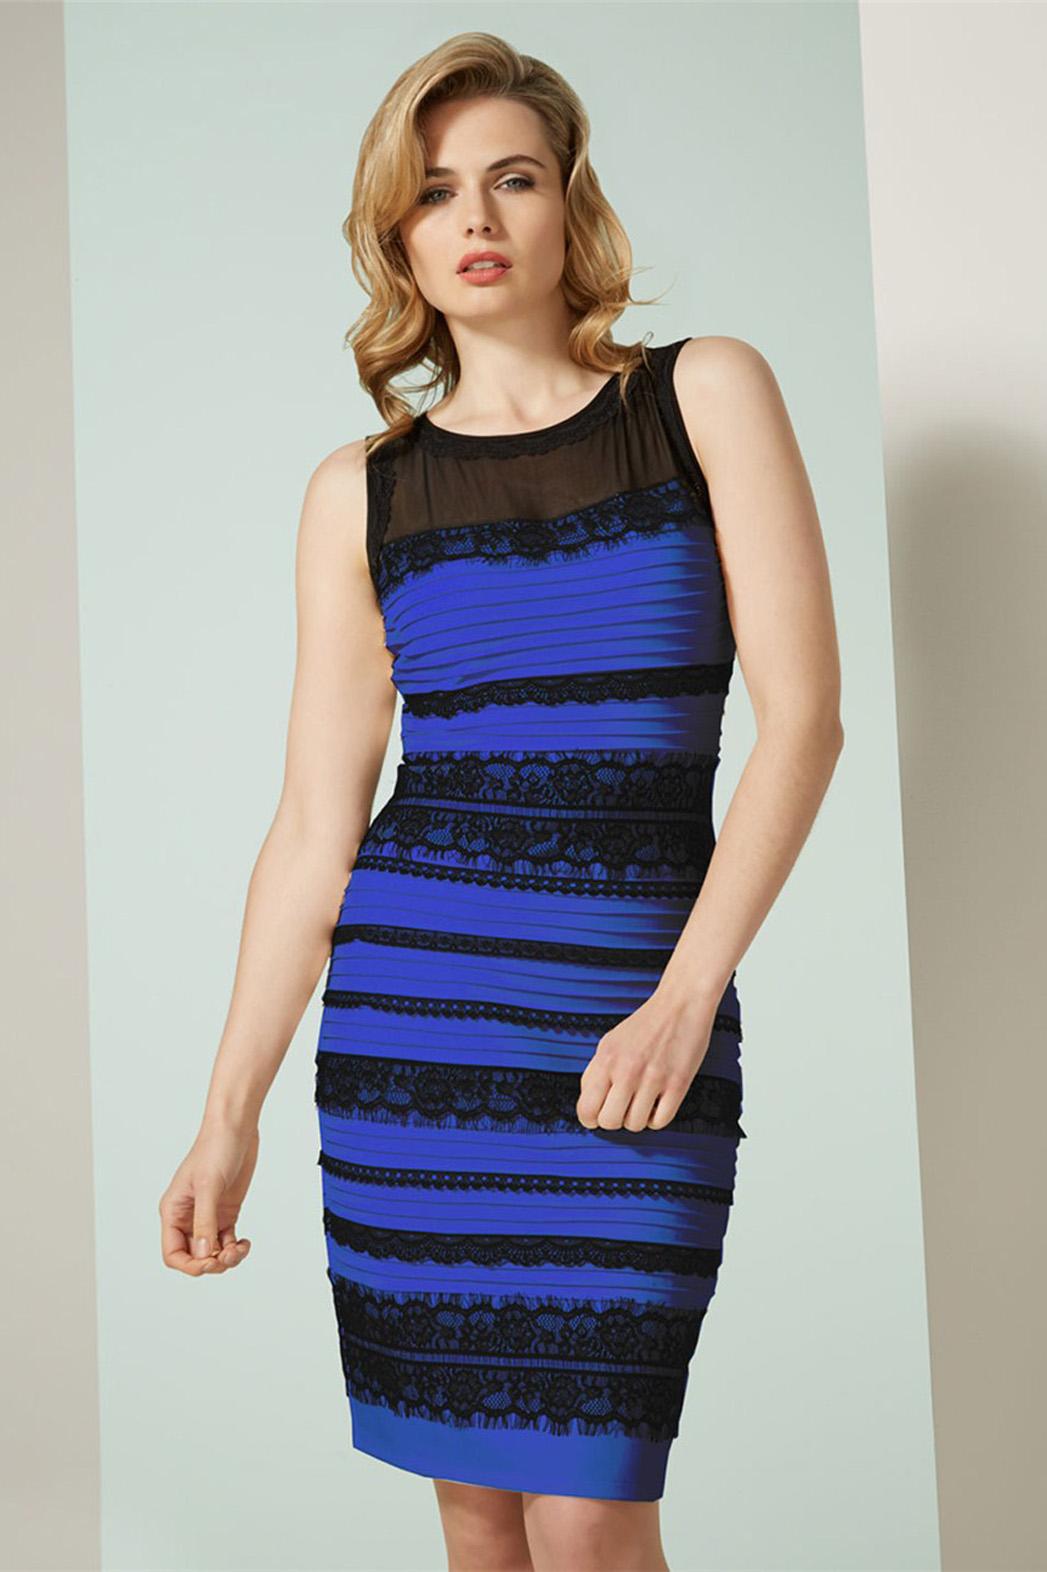 The Dress Blue Black - P 2015